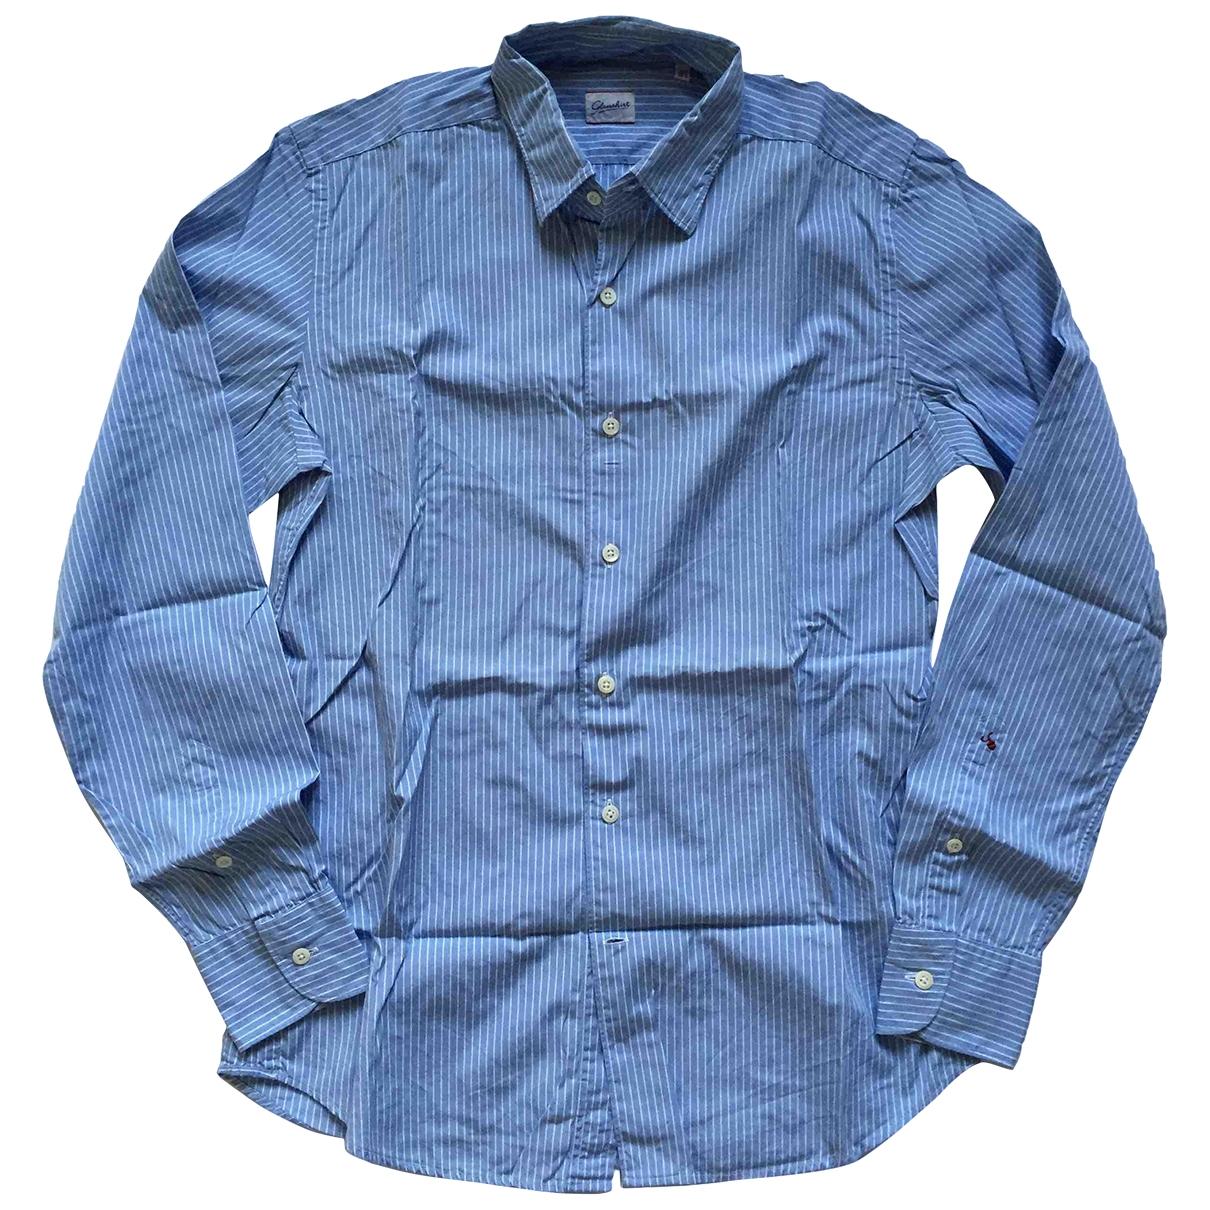 Slowear \N Cotton Shirts for Men 40 EU (tour de cou / collar)